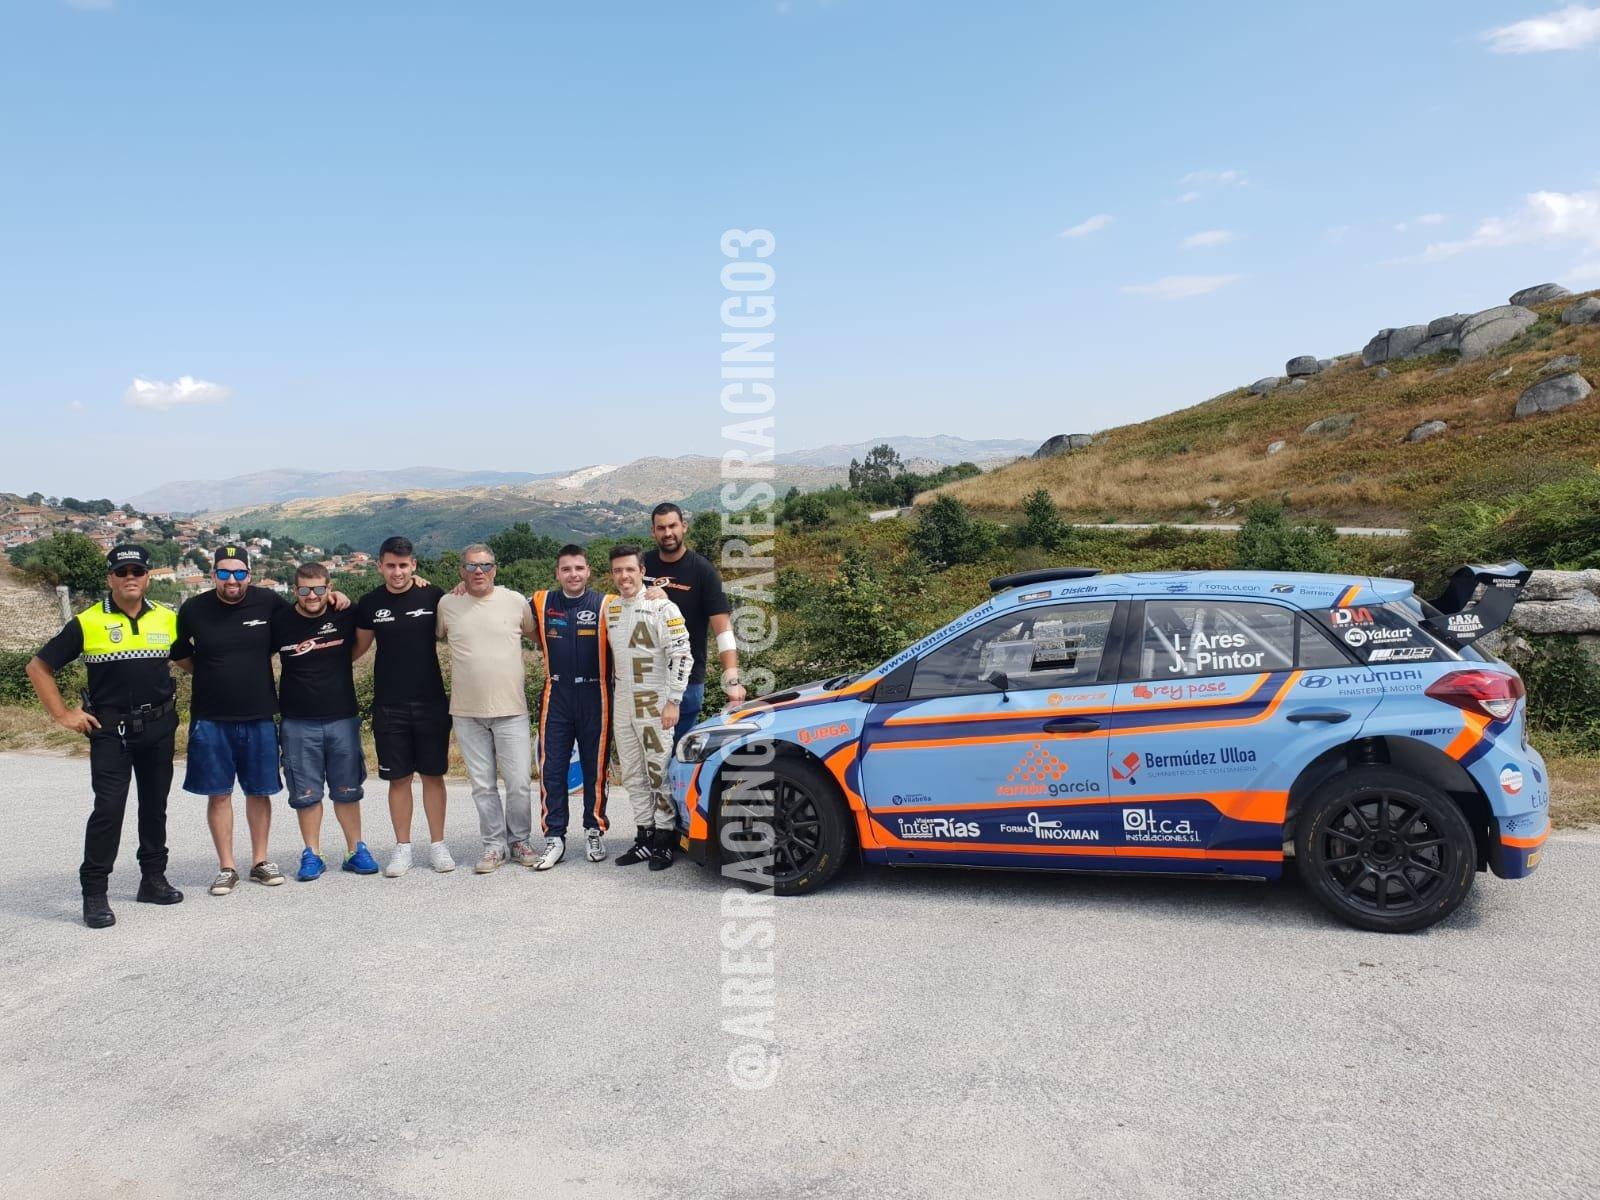 CERA: 55º Rallye Princesa de Asturias + Gr. A Legend Rallye [14-15 Septiembre] Dmkh6kRXoAErRqb